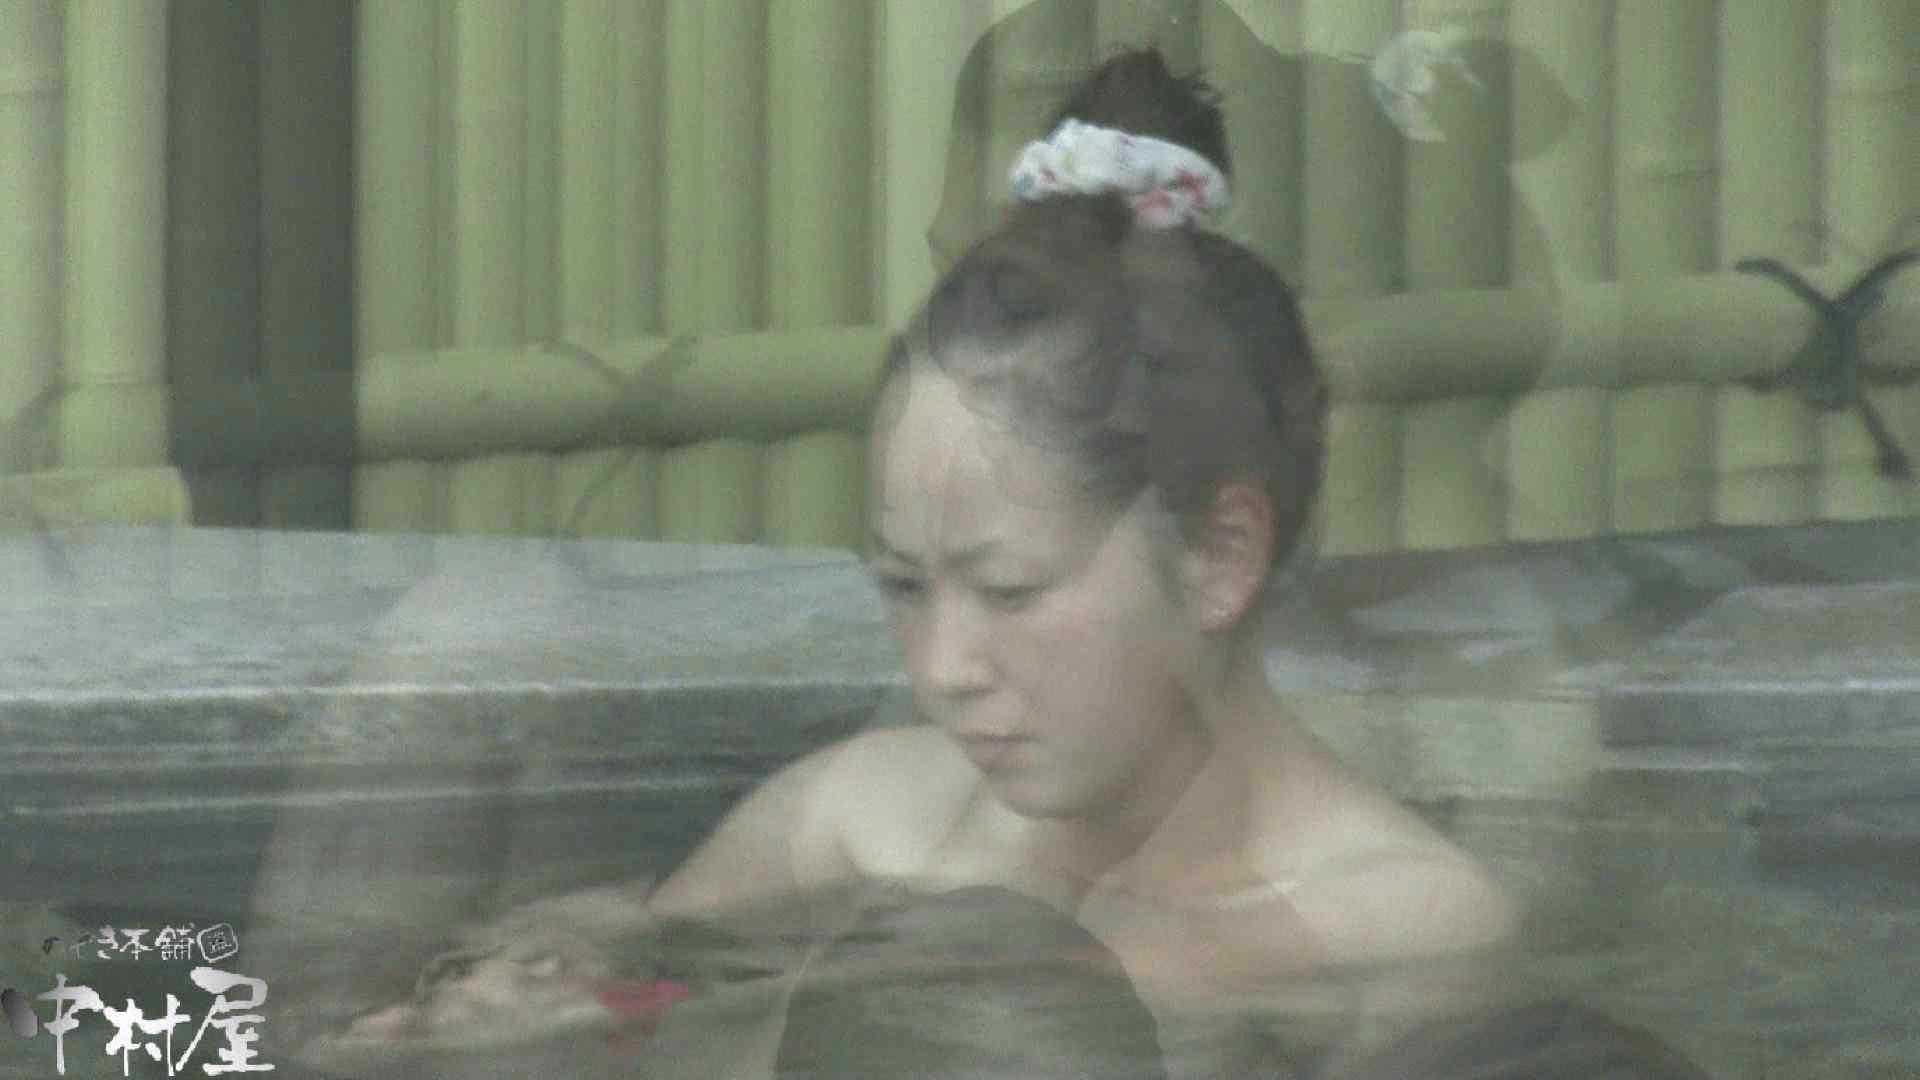 Aquaな露天風呂Vol.911 OLセックス 隠し撮りすけべAV動画紹介 107画像 92